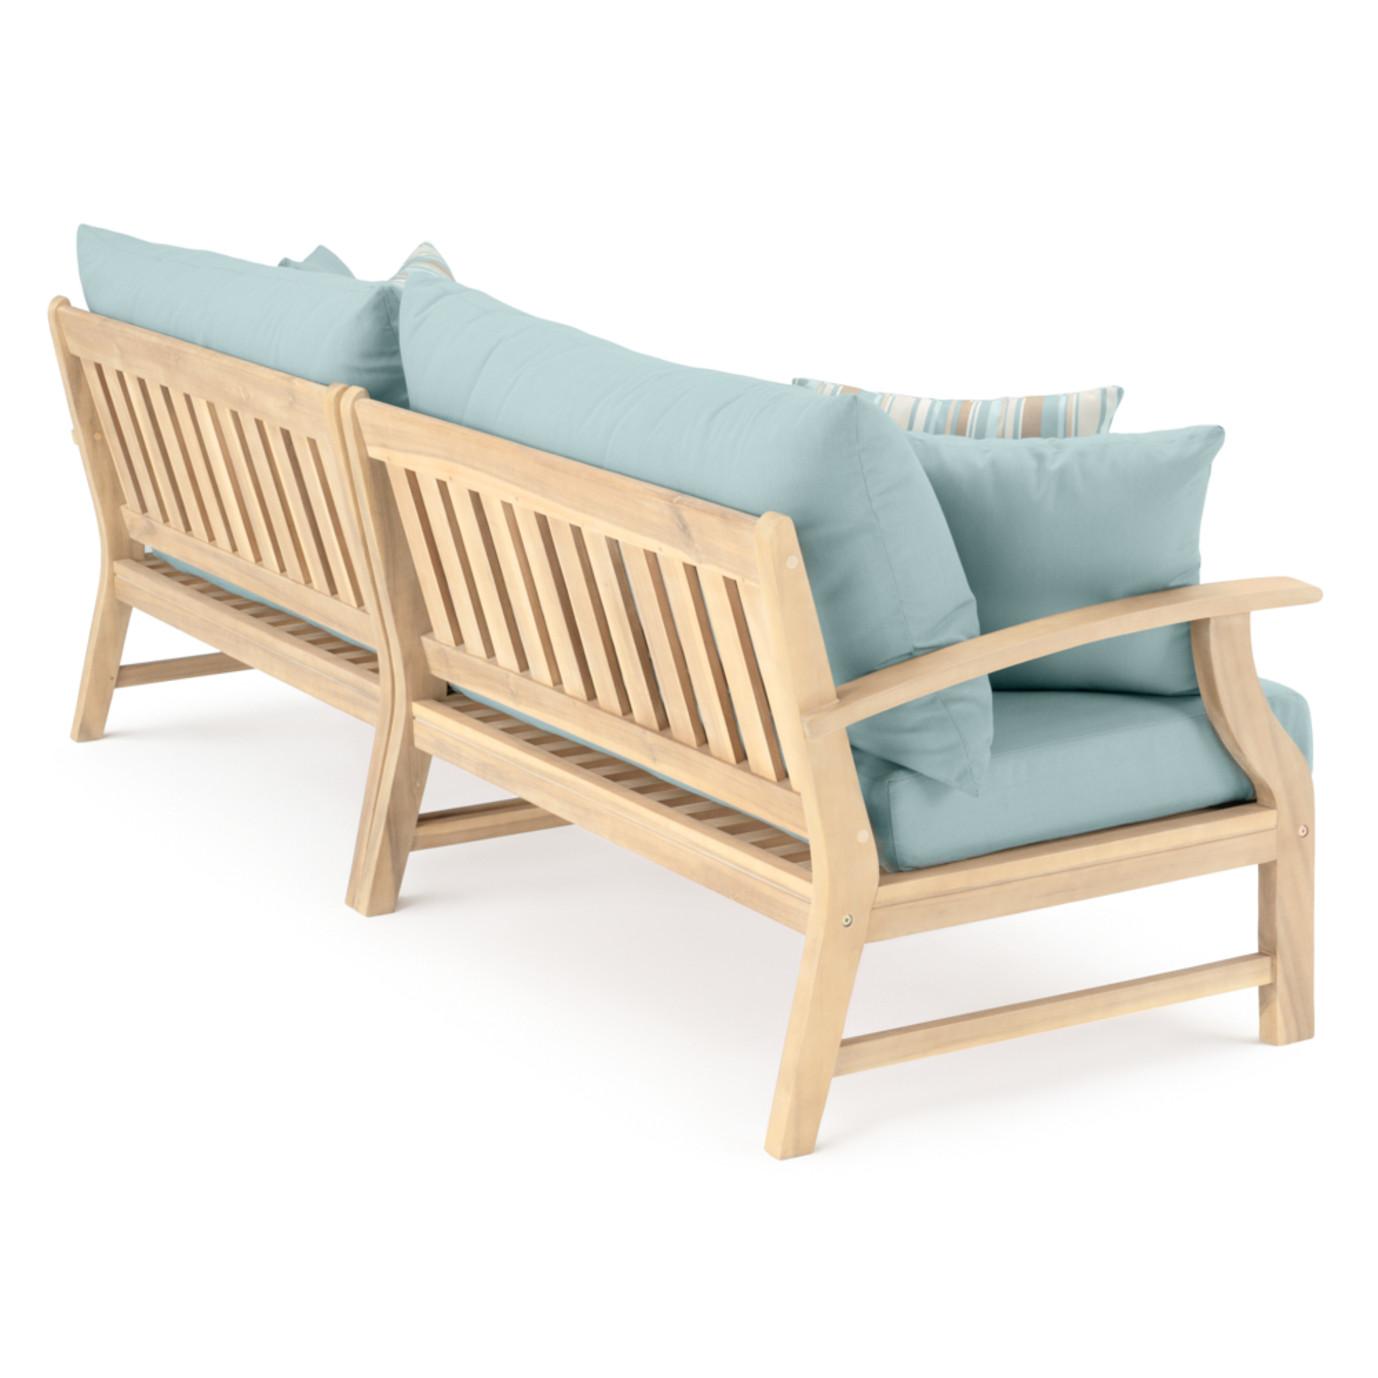 Kooper 96in Sofa - Bliss Blue